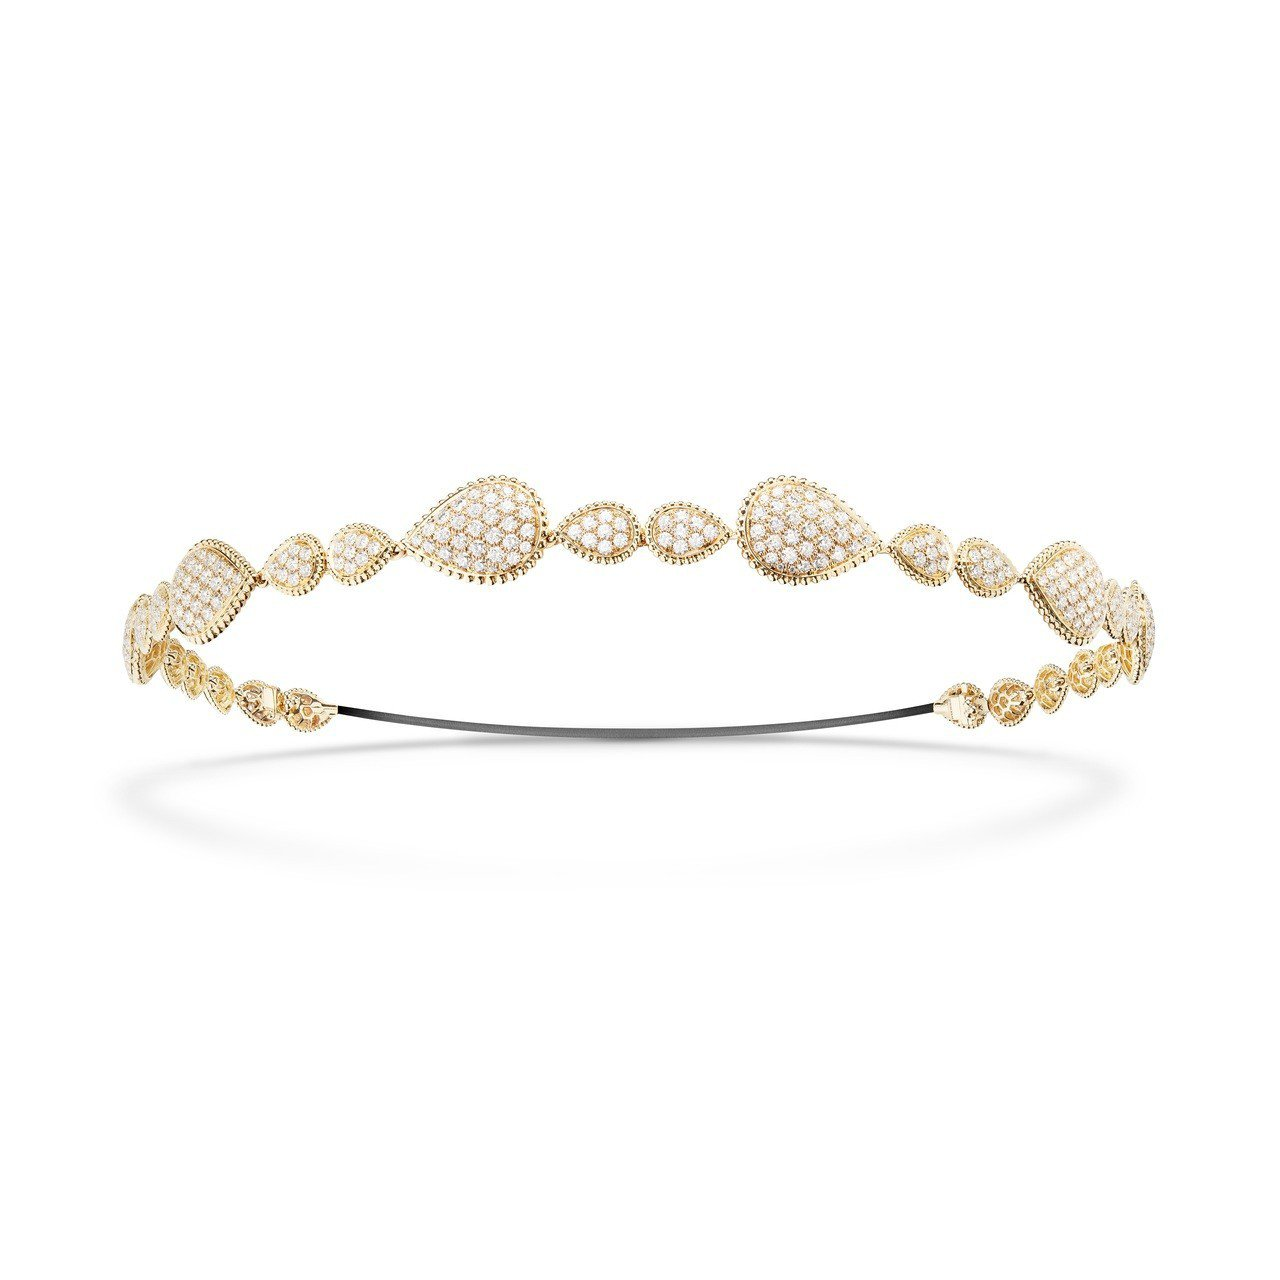 Serpent Bohème系列髮飾,18K黃金鑲嵌336顆鑽石共約13.57克...